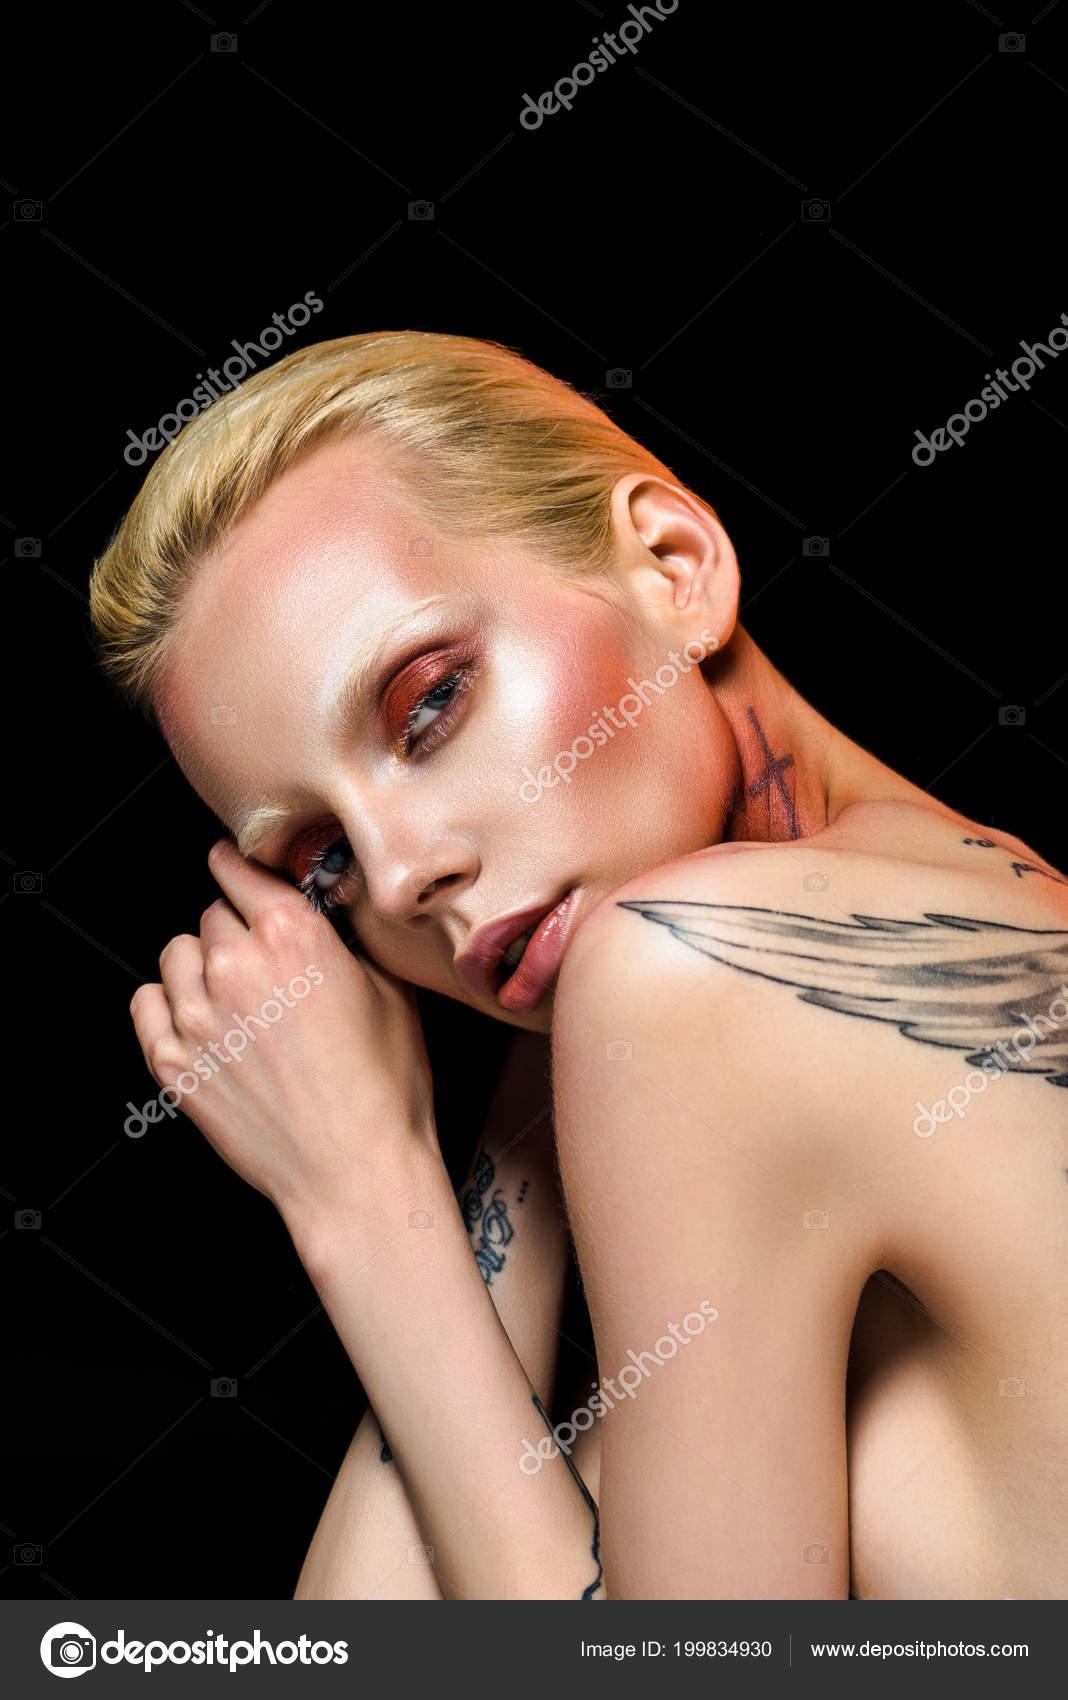 Chica Hermosa Desnuda Con Alas Tatuadas Espalda Aislado Negro Foto